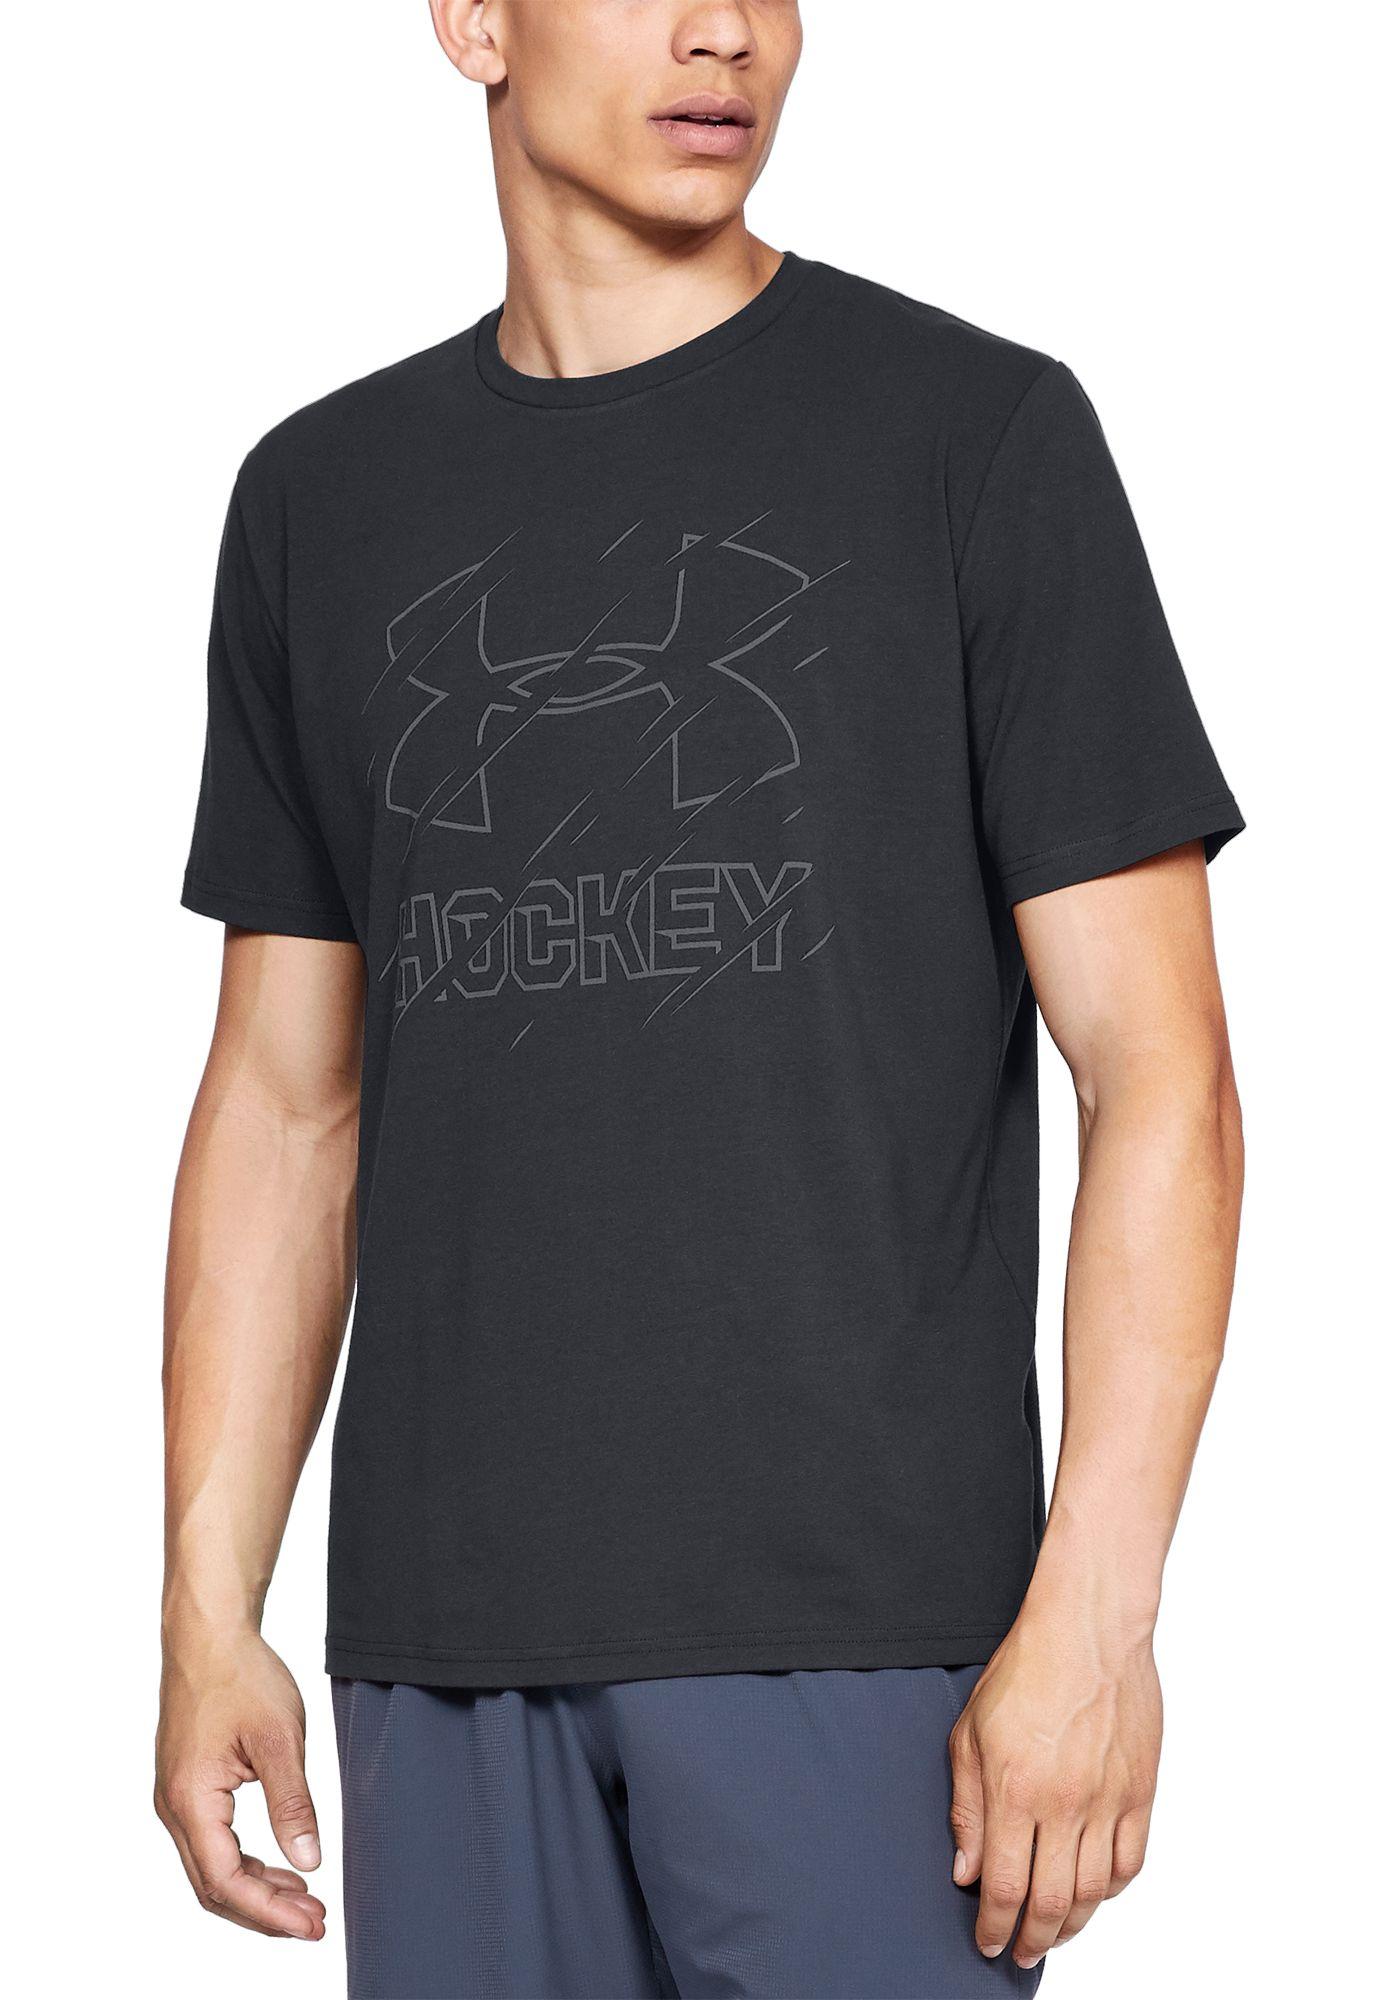 Under Armour Adult Hockey T-Shirt